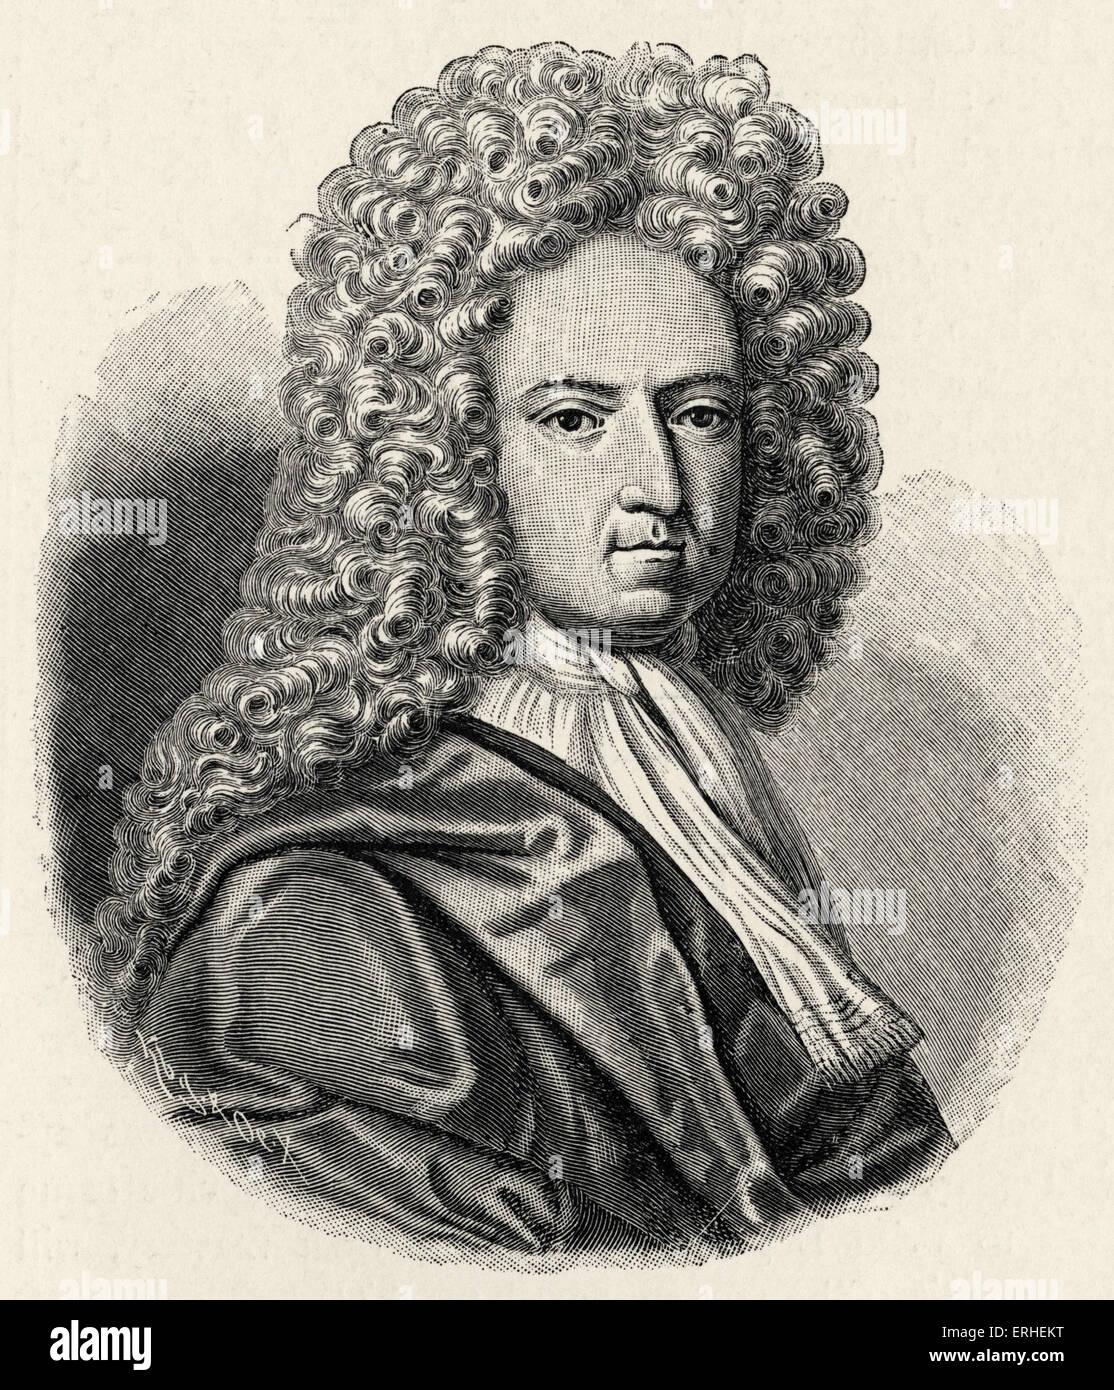 Daniel Defoe -  portrait. English author and journalist 1660-1731 - Stock Image